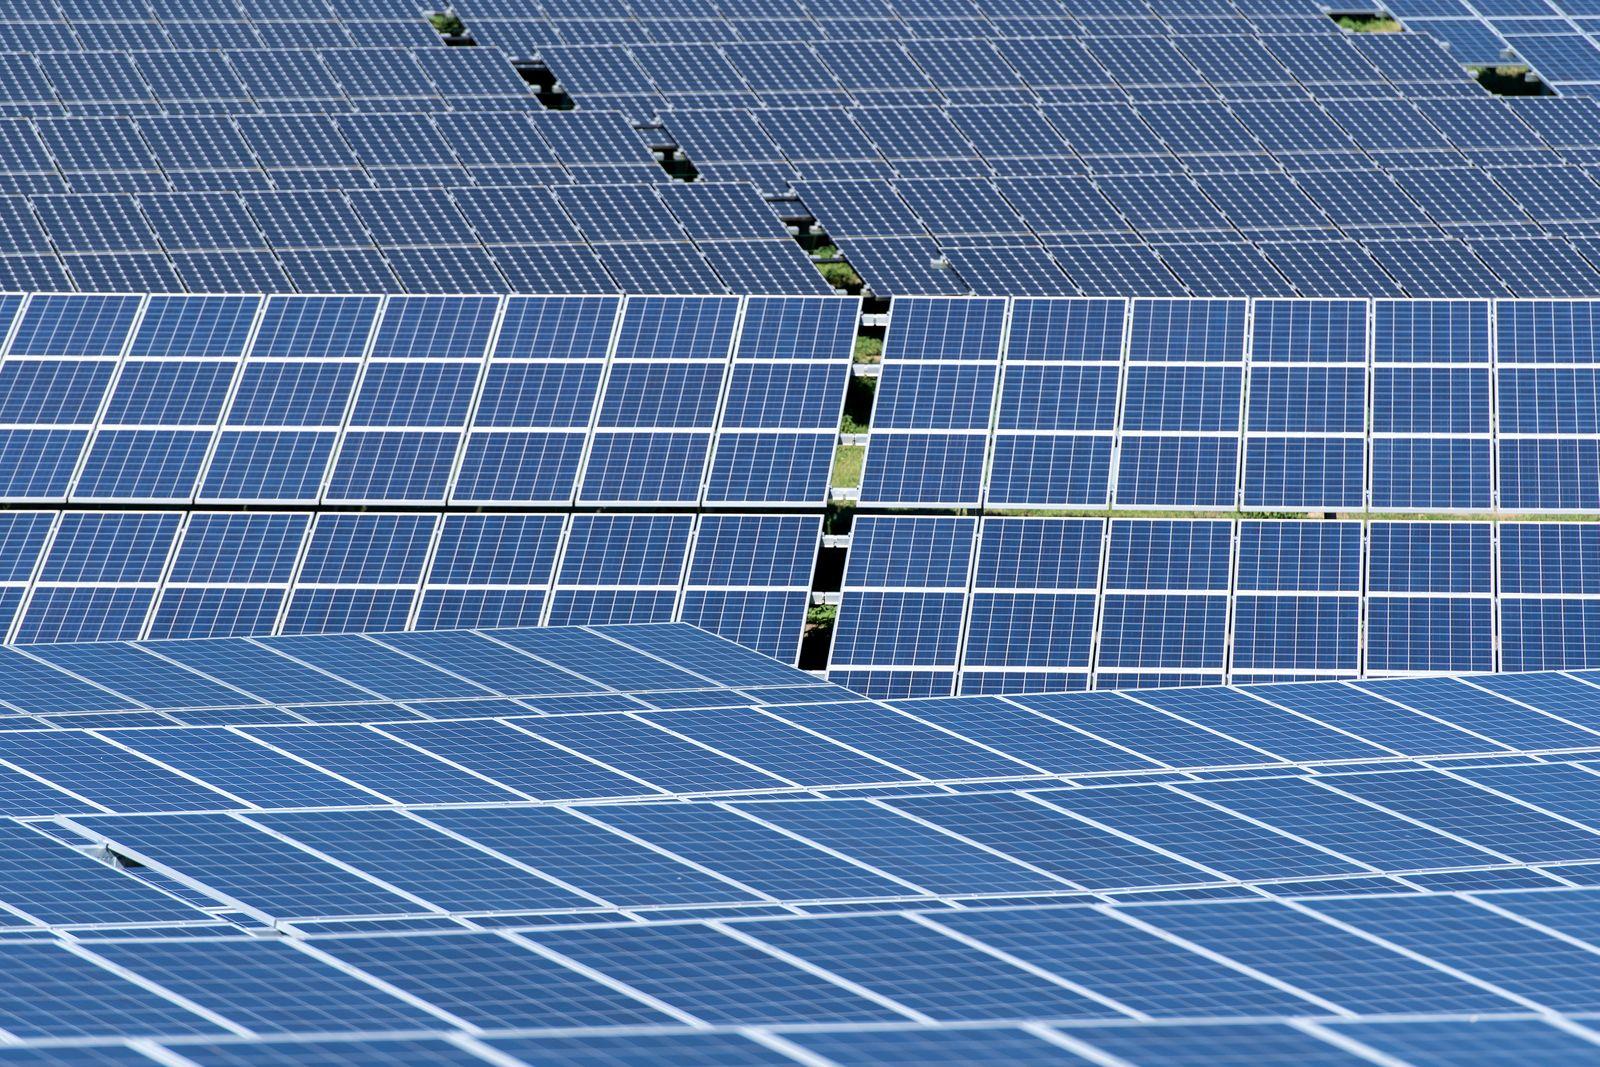 Solaranlage. Symbolbild